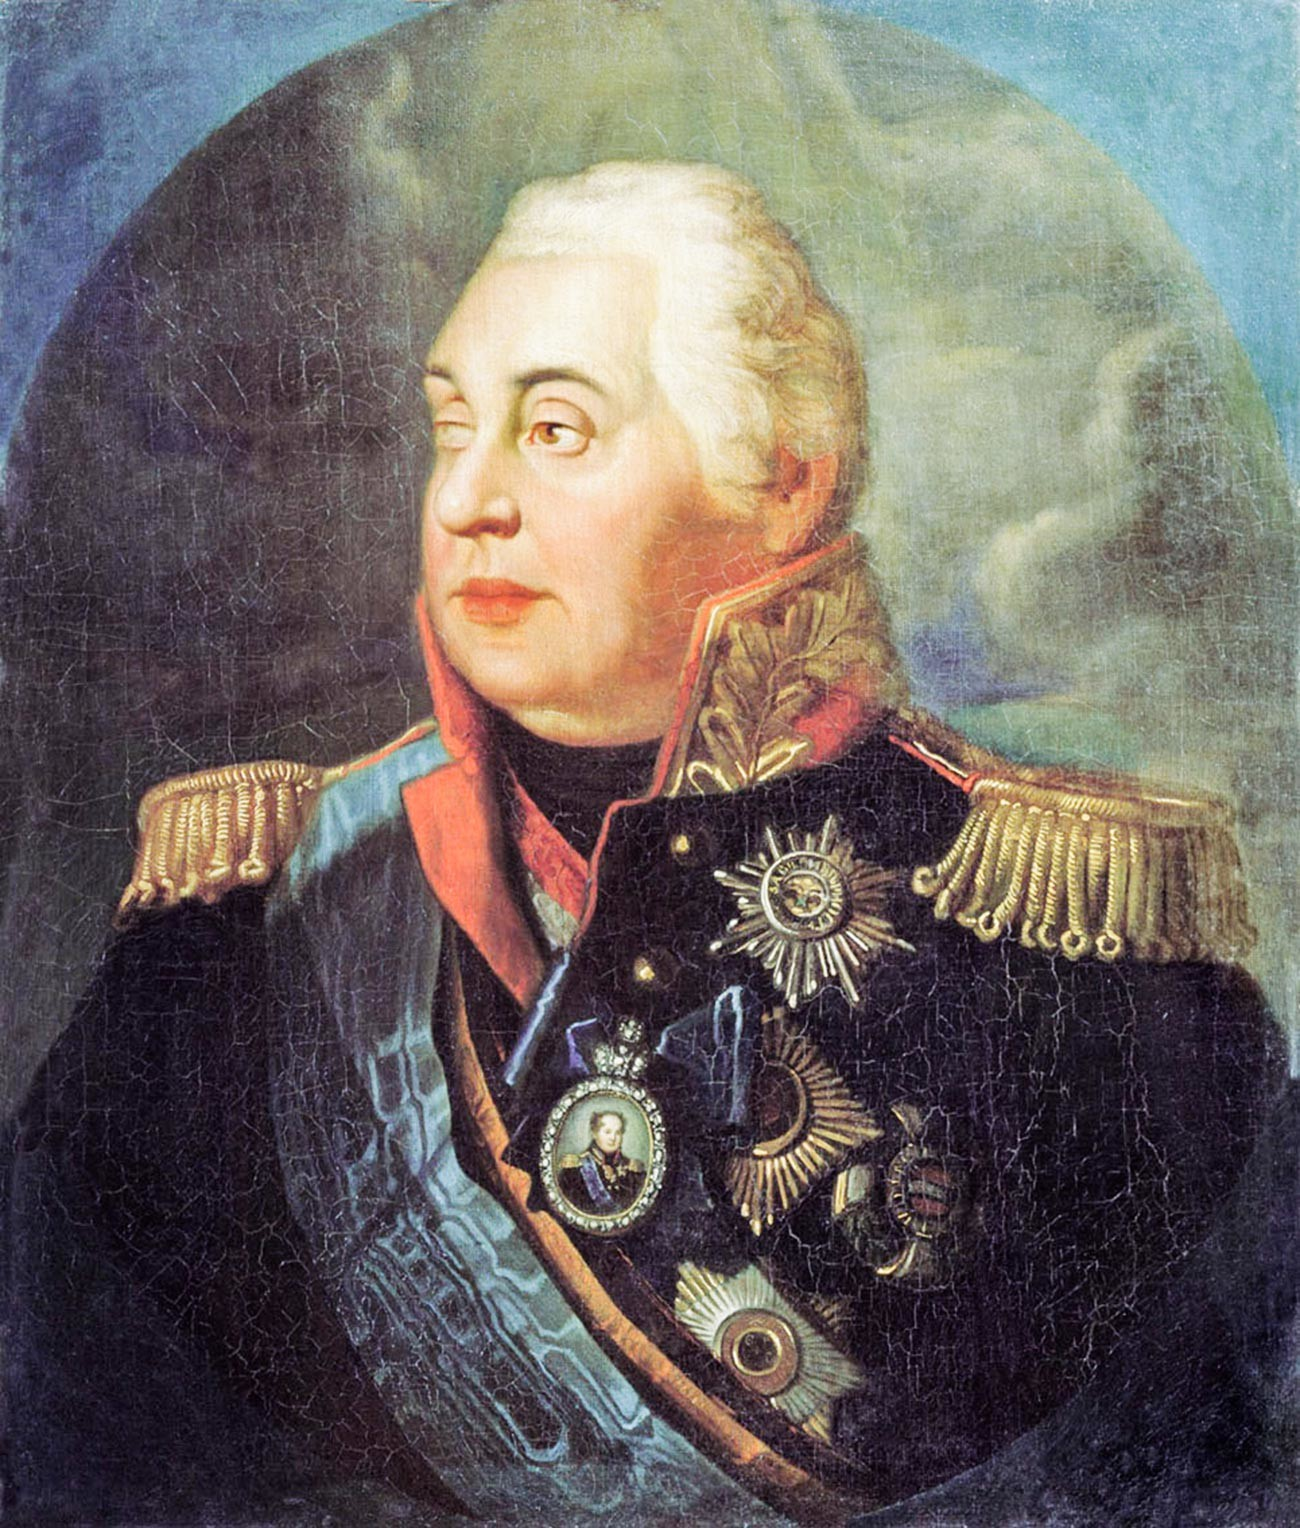 Портрет руского фелдмаршала М.И. Кутузова.